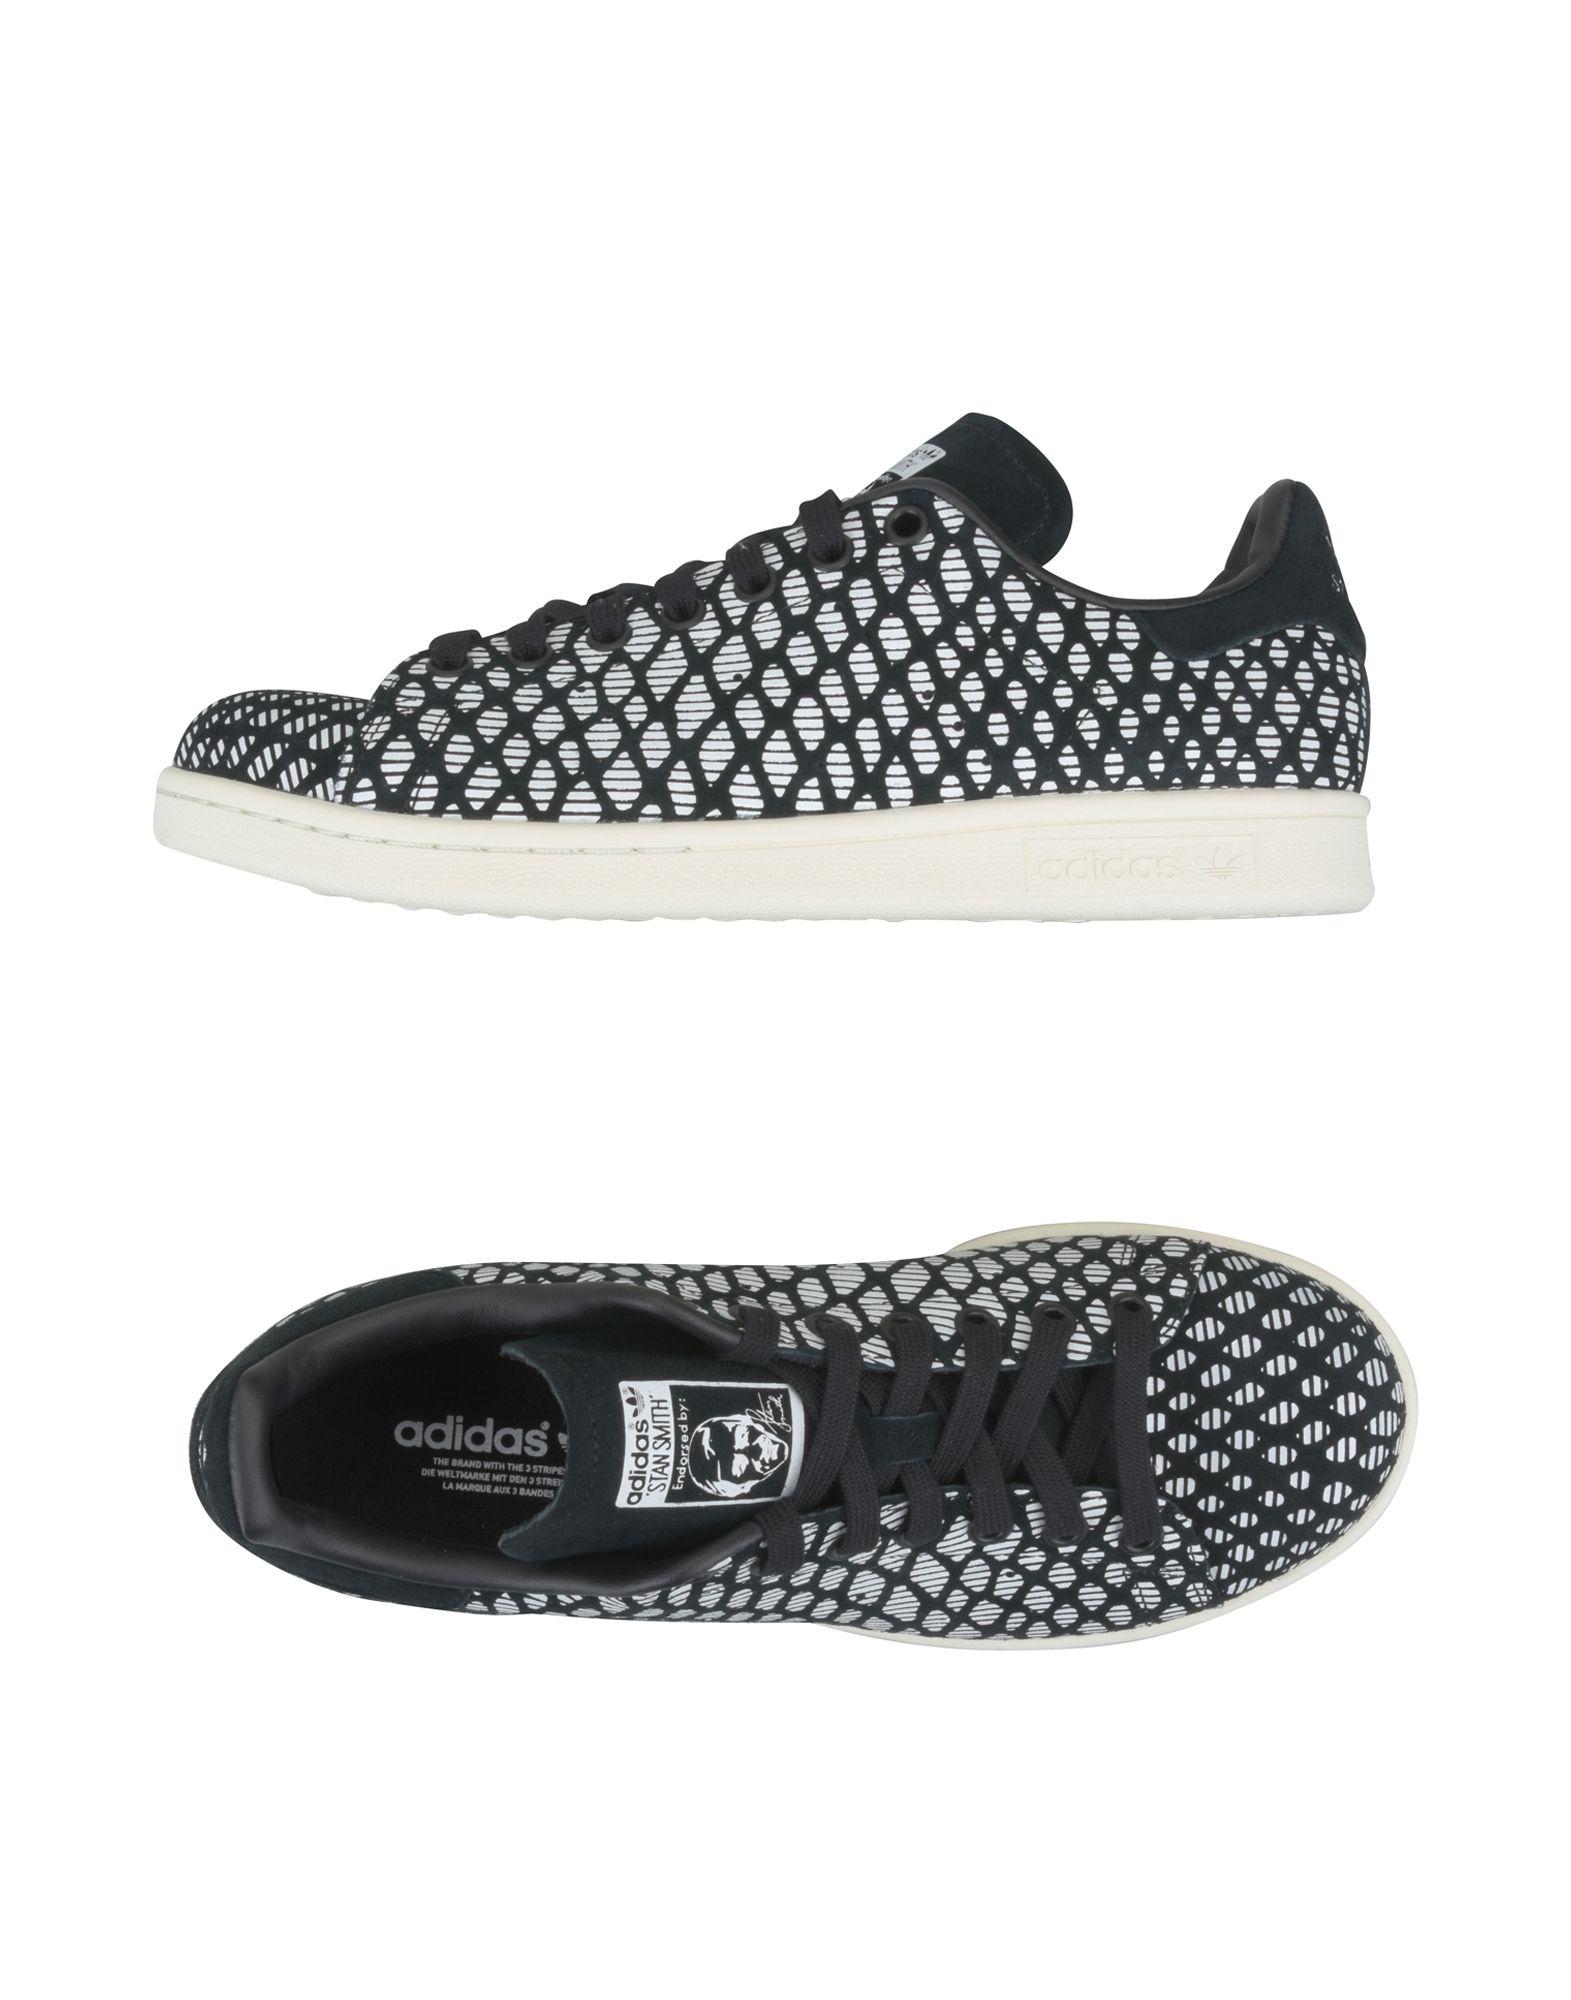 ADIDAS ORIGINALS Damen Low Sneakers & Tennisschuhe Farbe Schwarz Größe 9